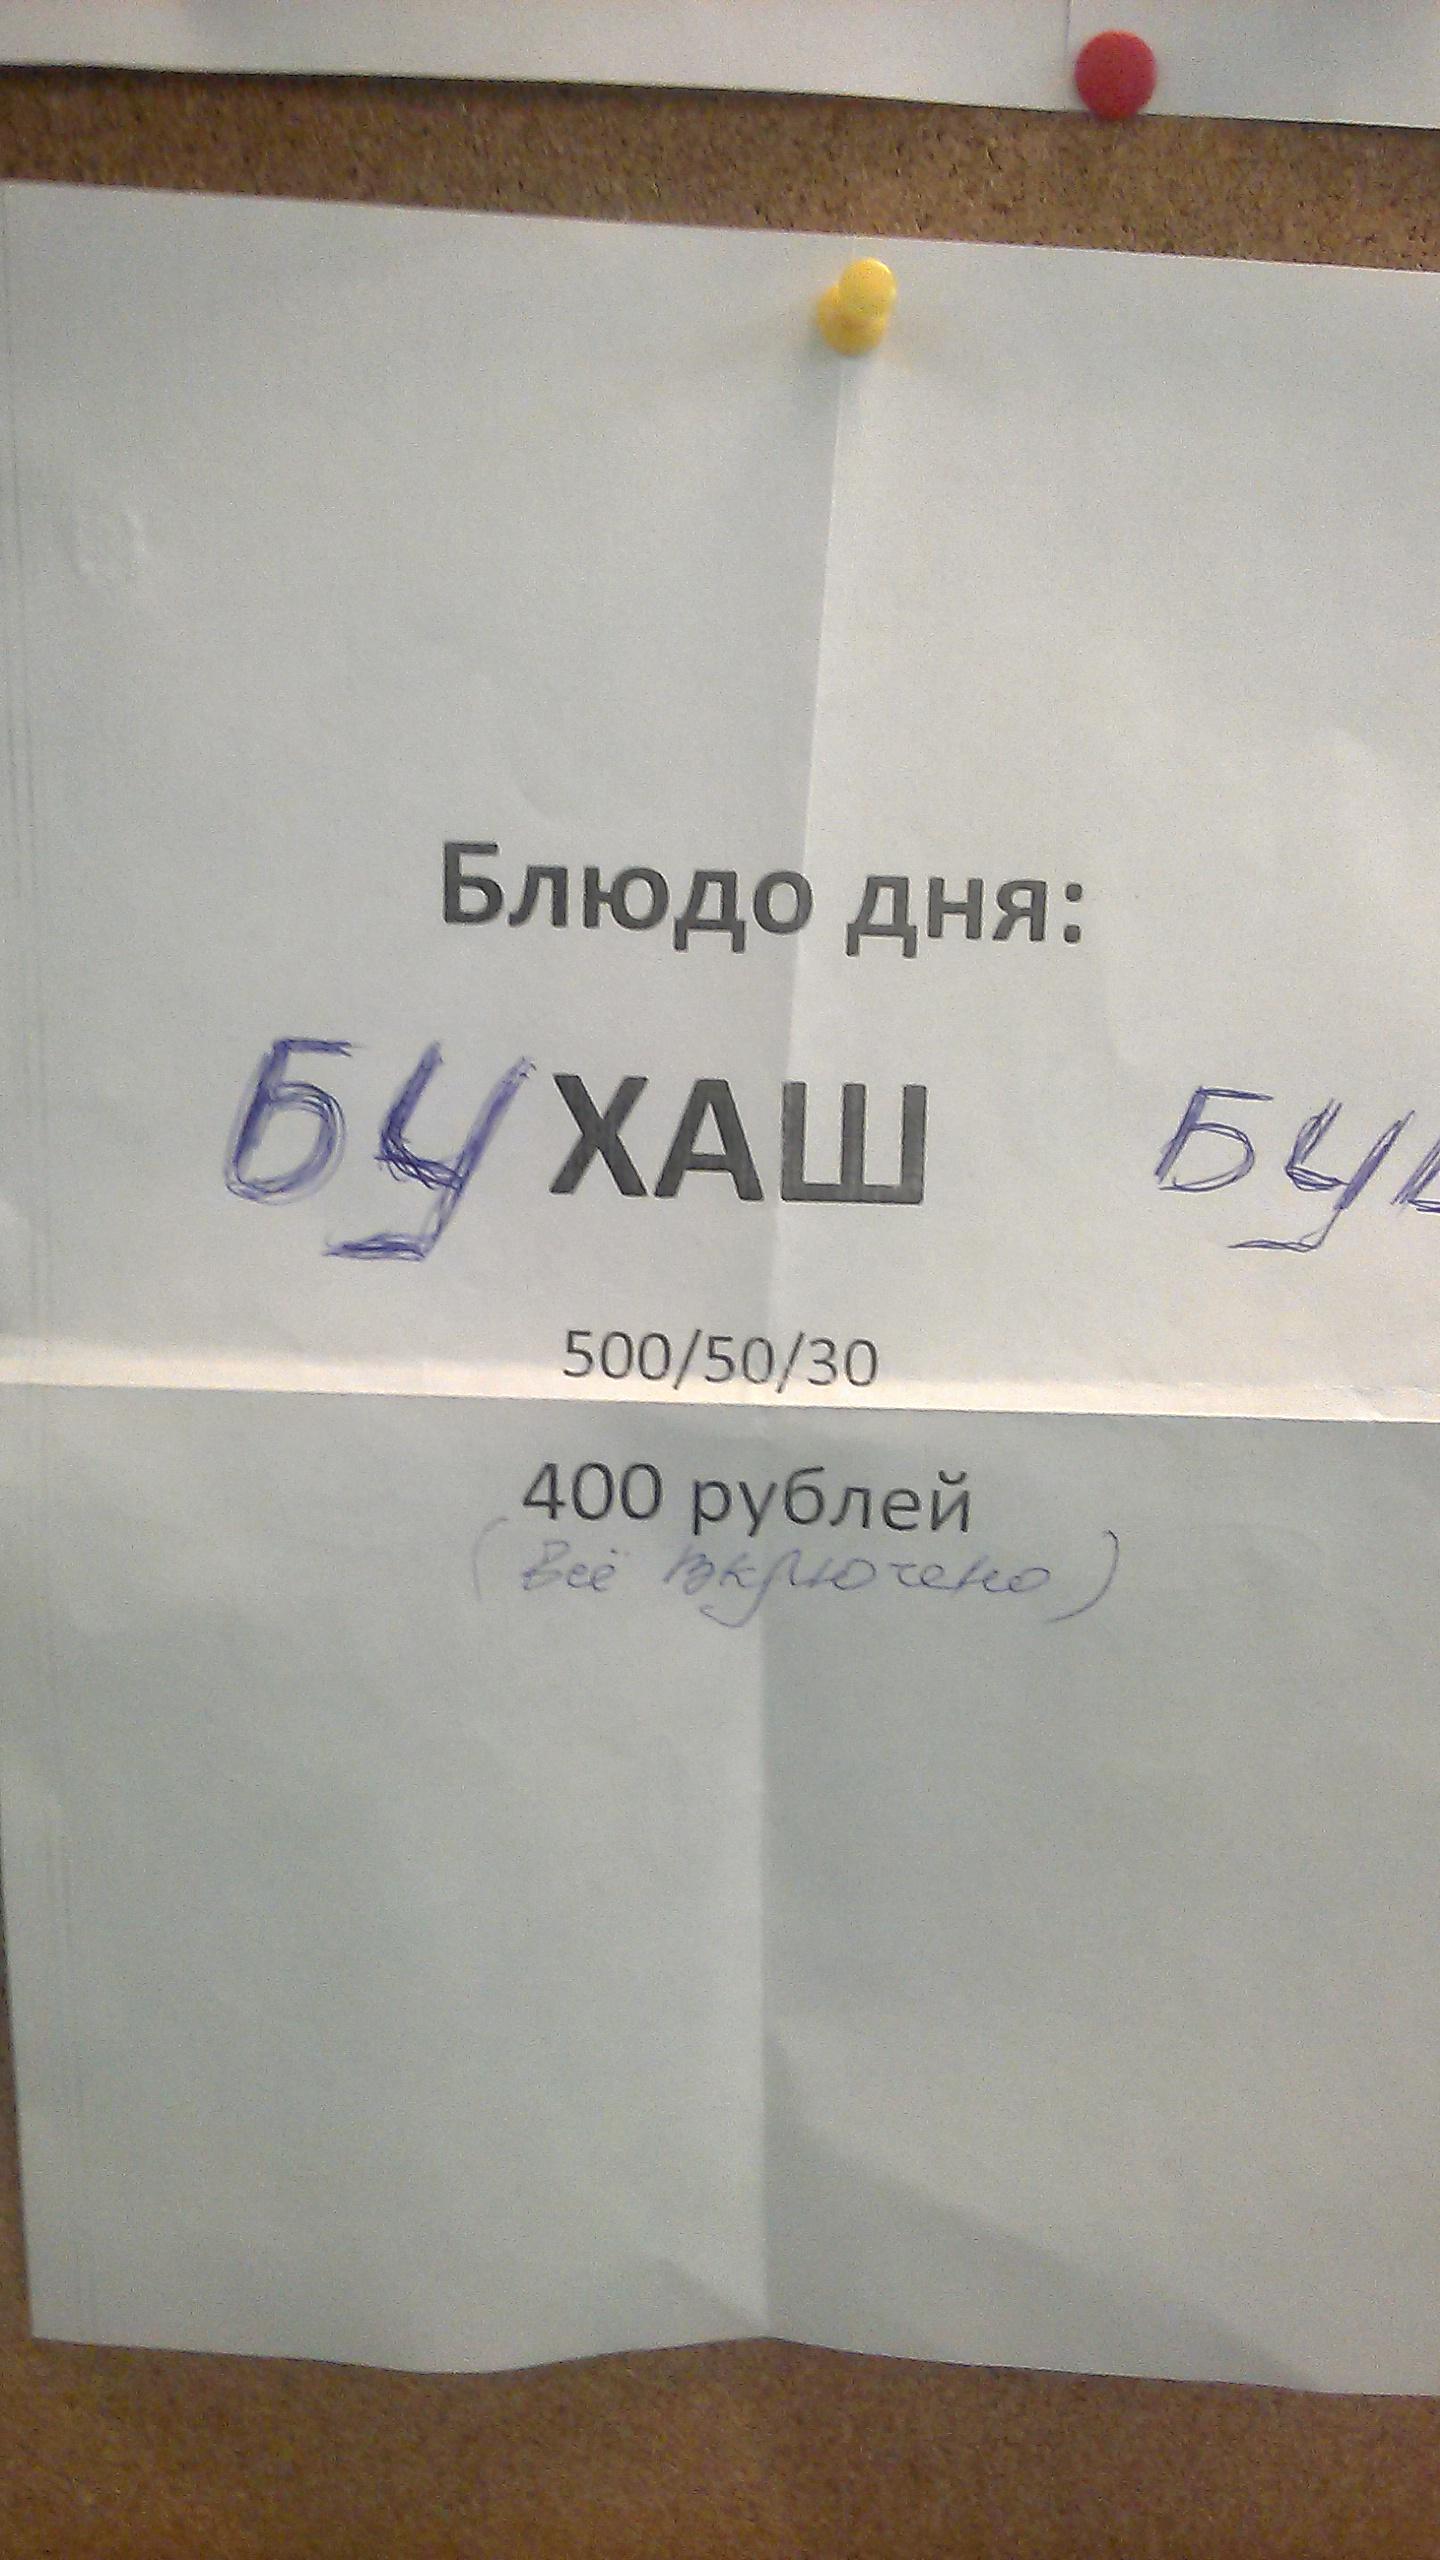 http://s0.uploads.ru/PIYJd.jpg